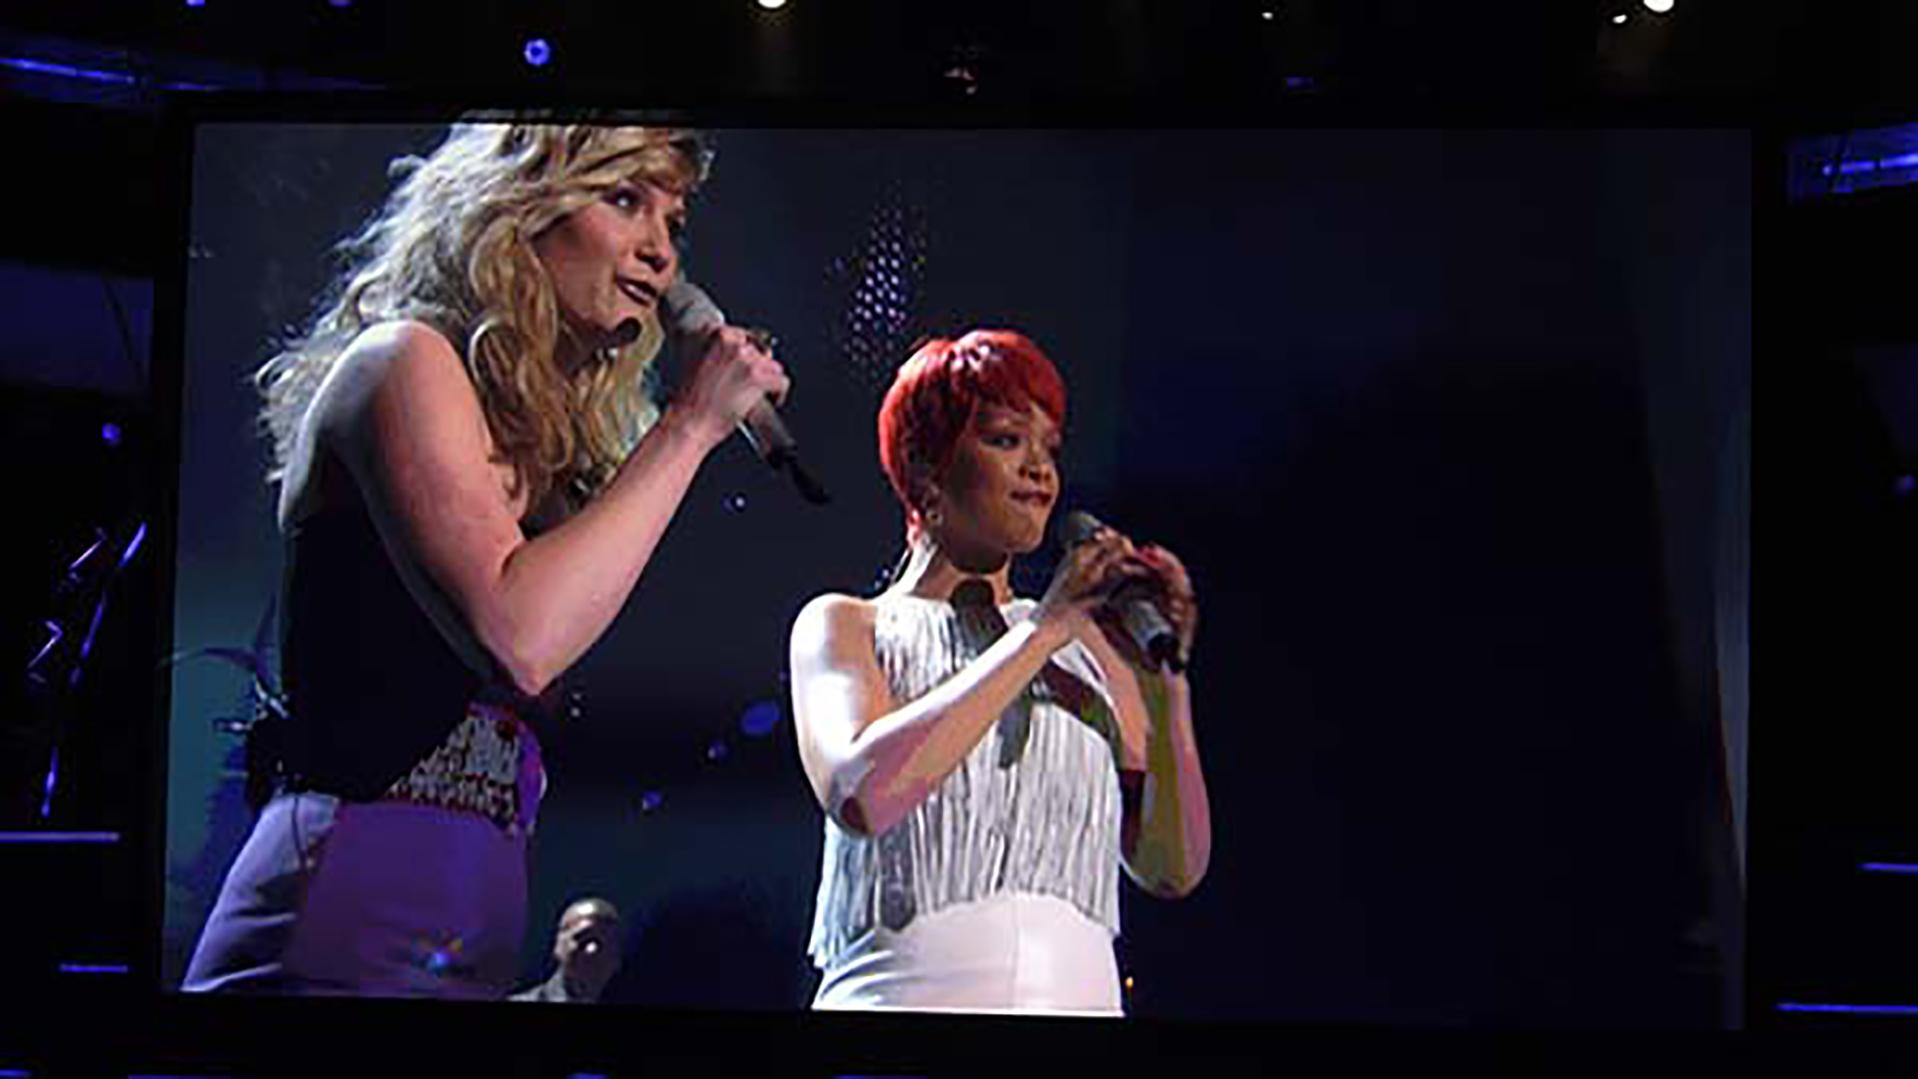 4. Jennifer Nettles and Rihanna perform